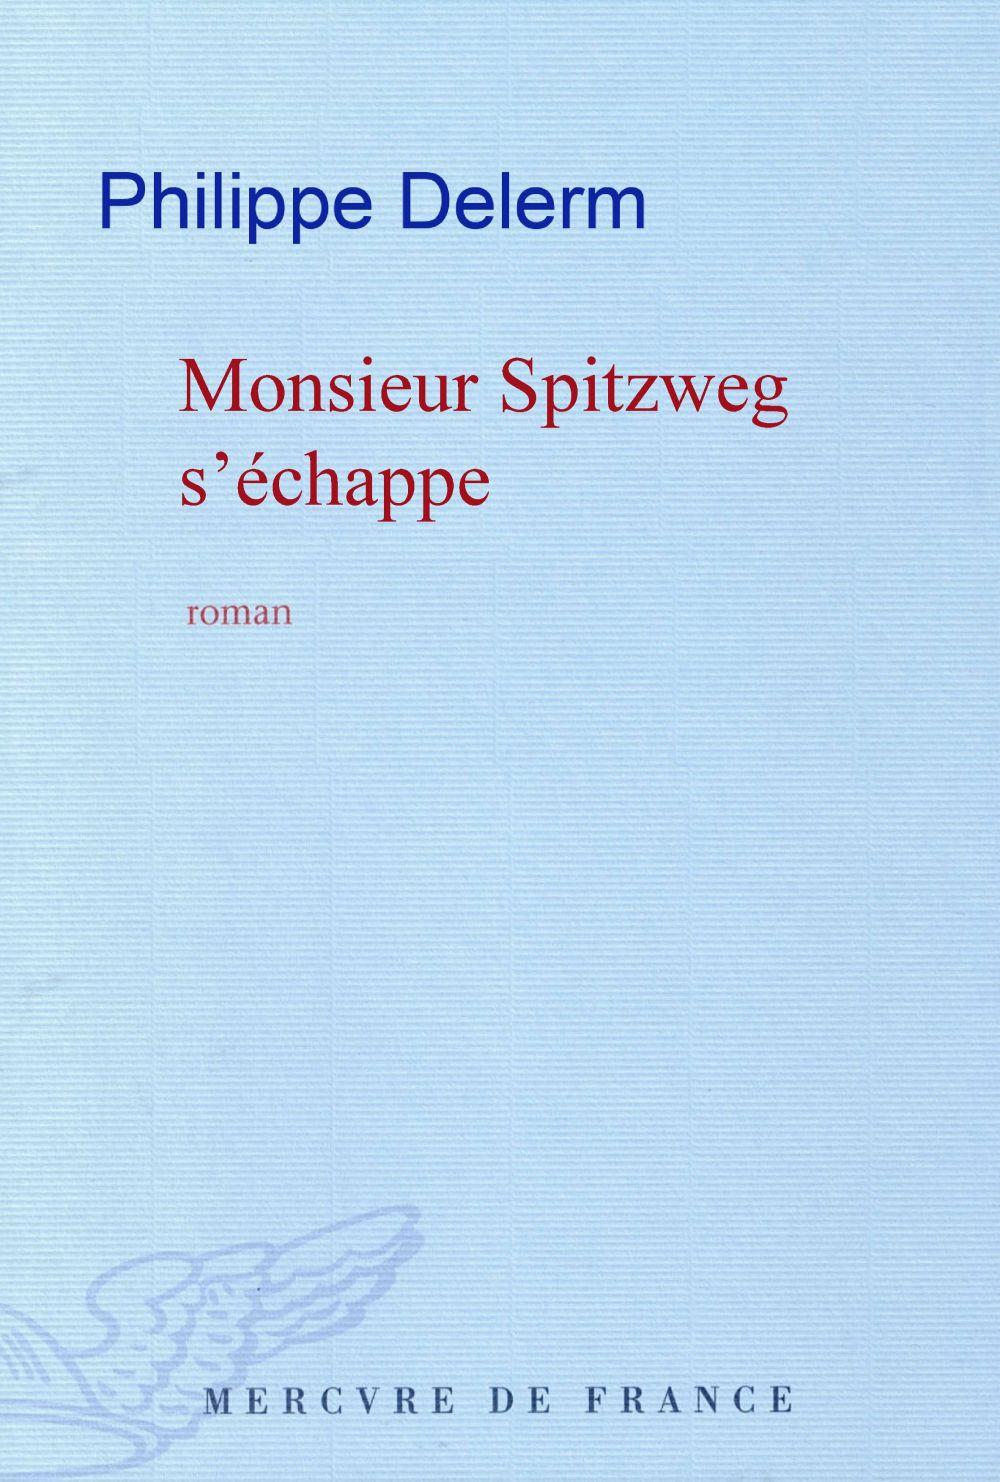 Monsieur Spitzweg s'échappe  